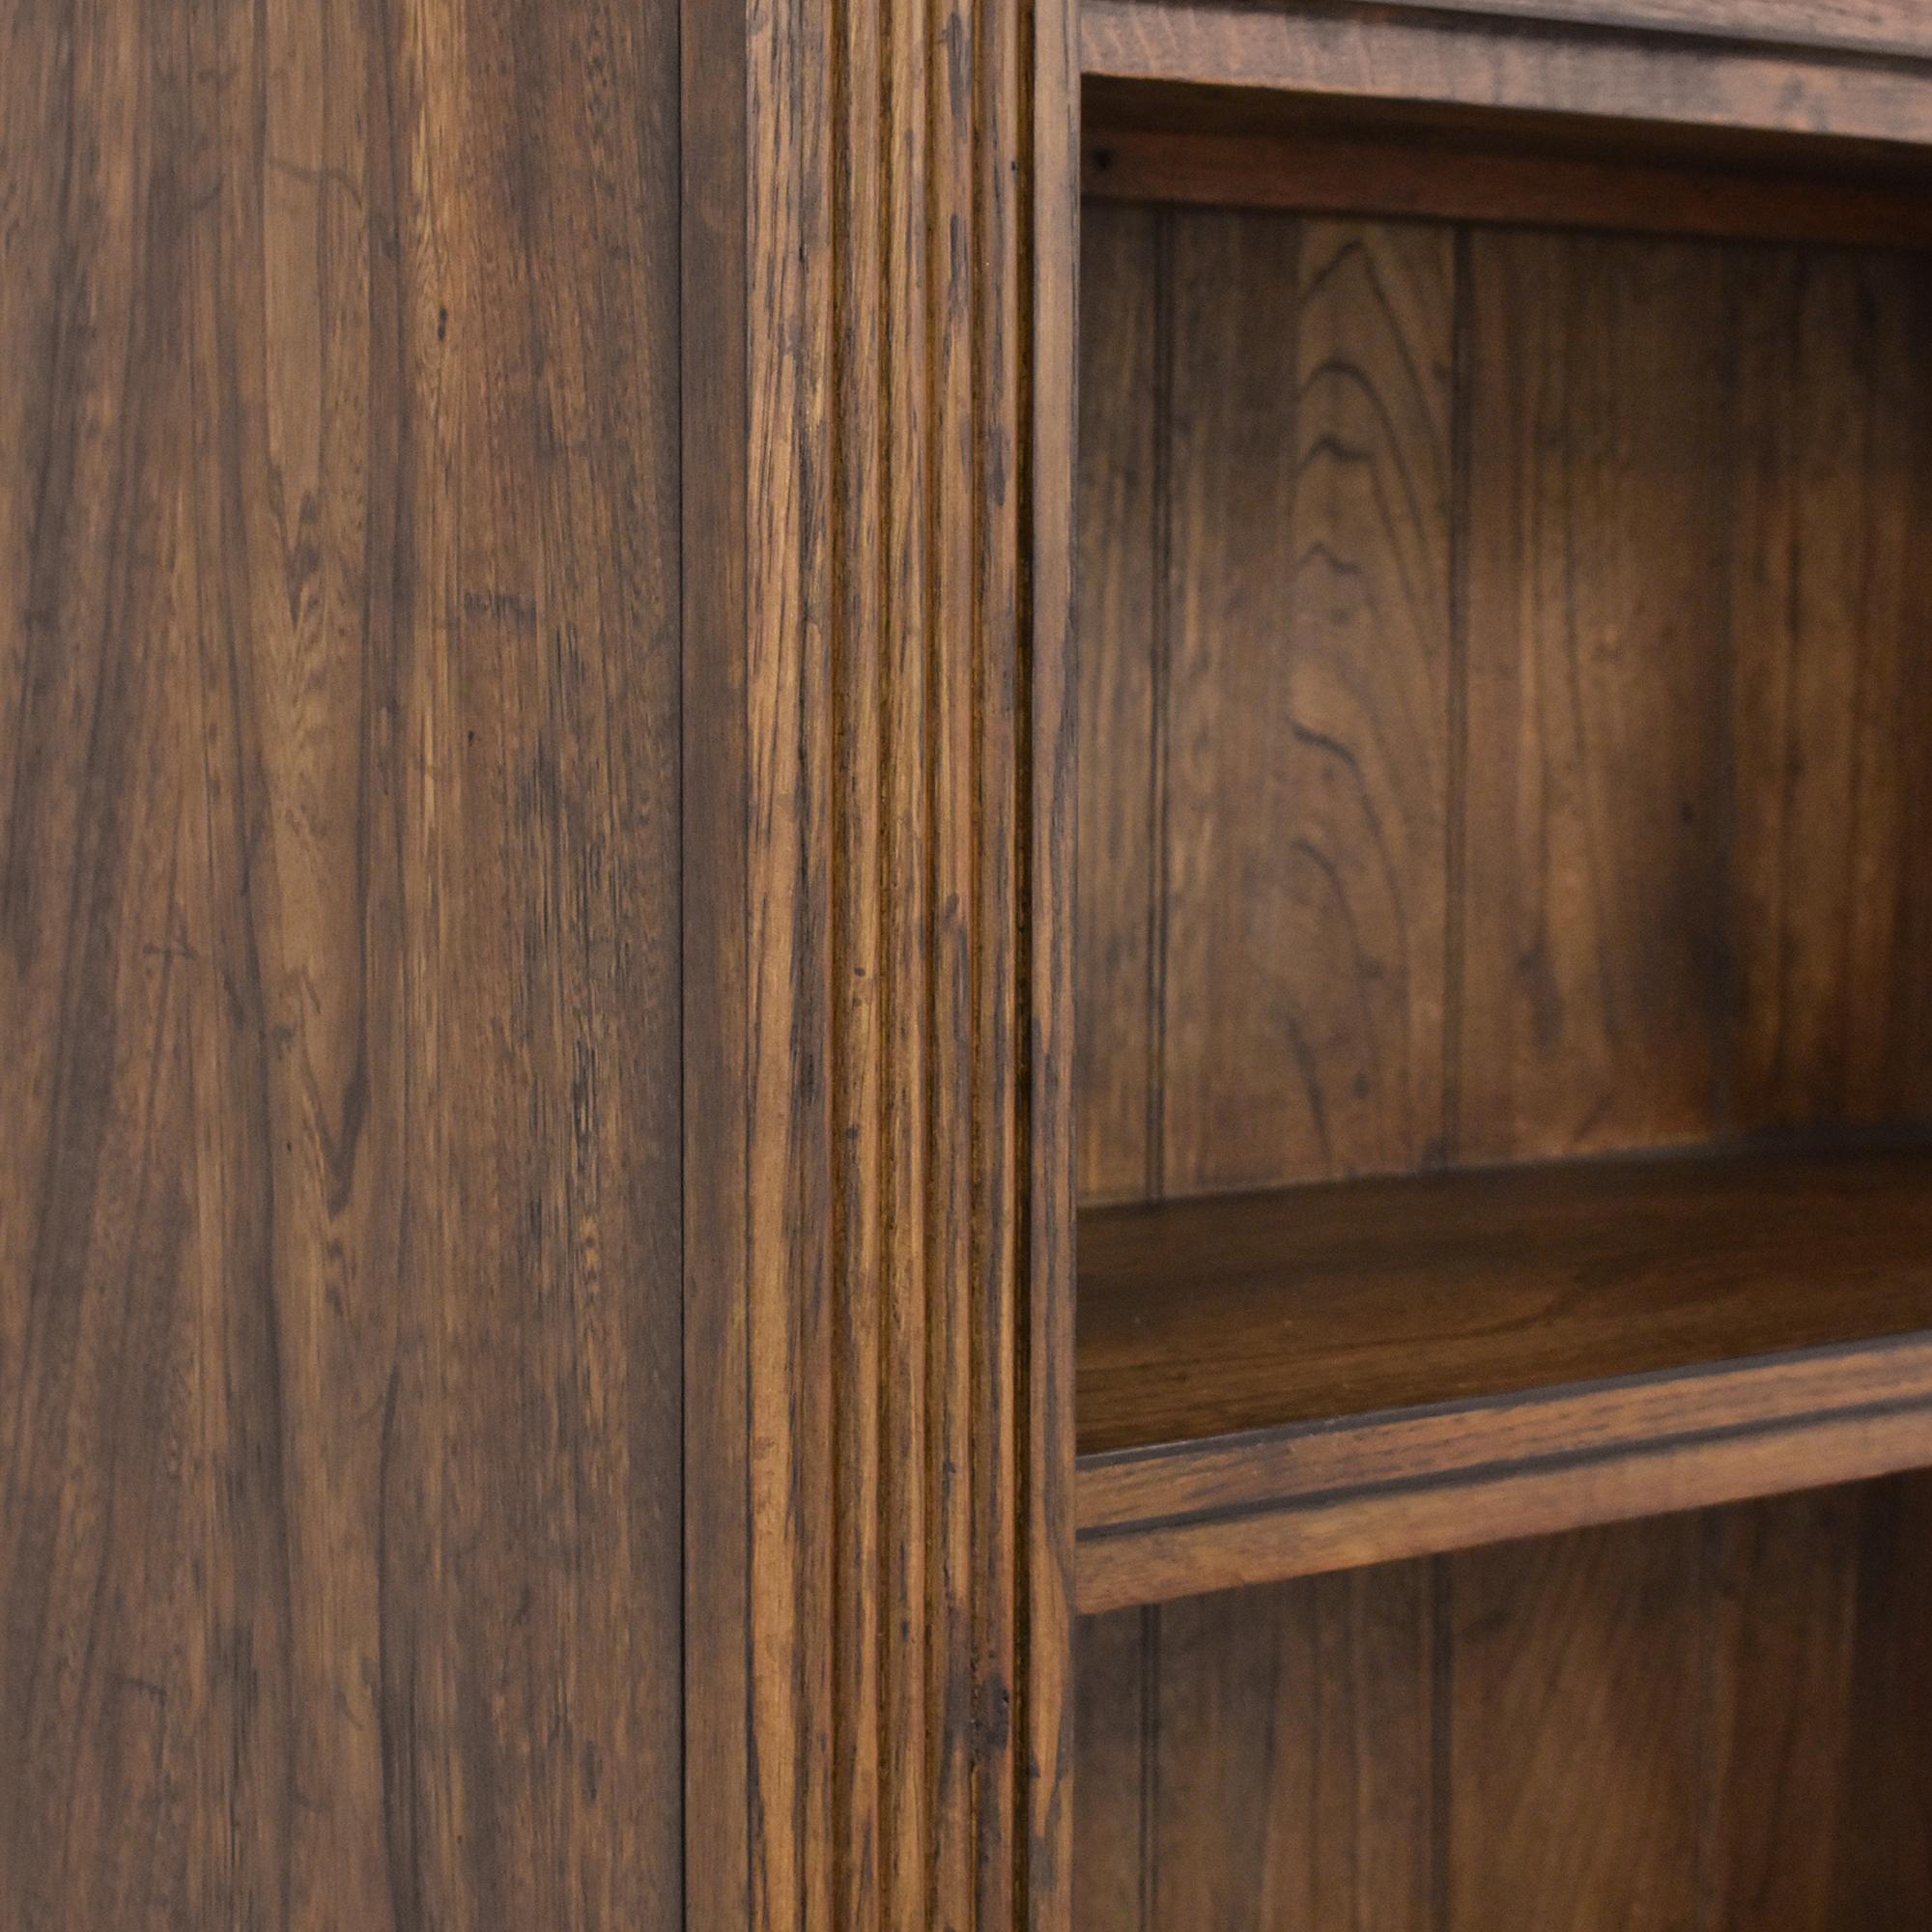 Ethan Allen Ethan Allen Double Bookcase second hand